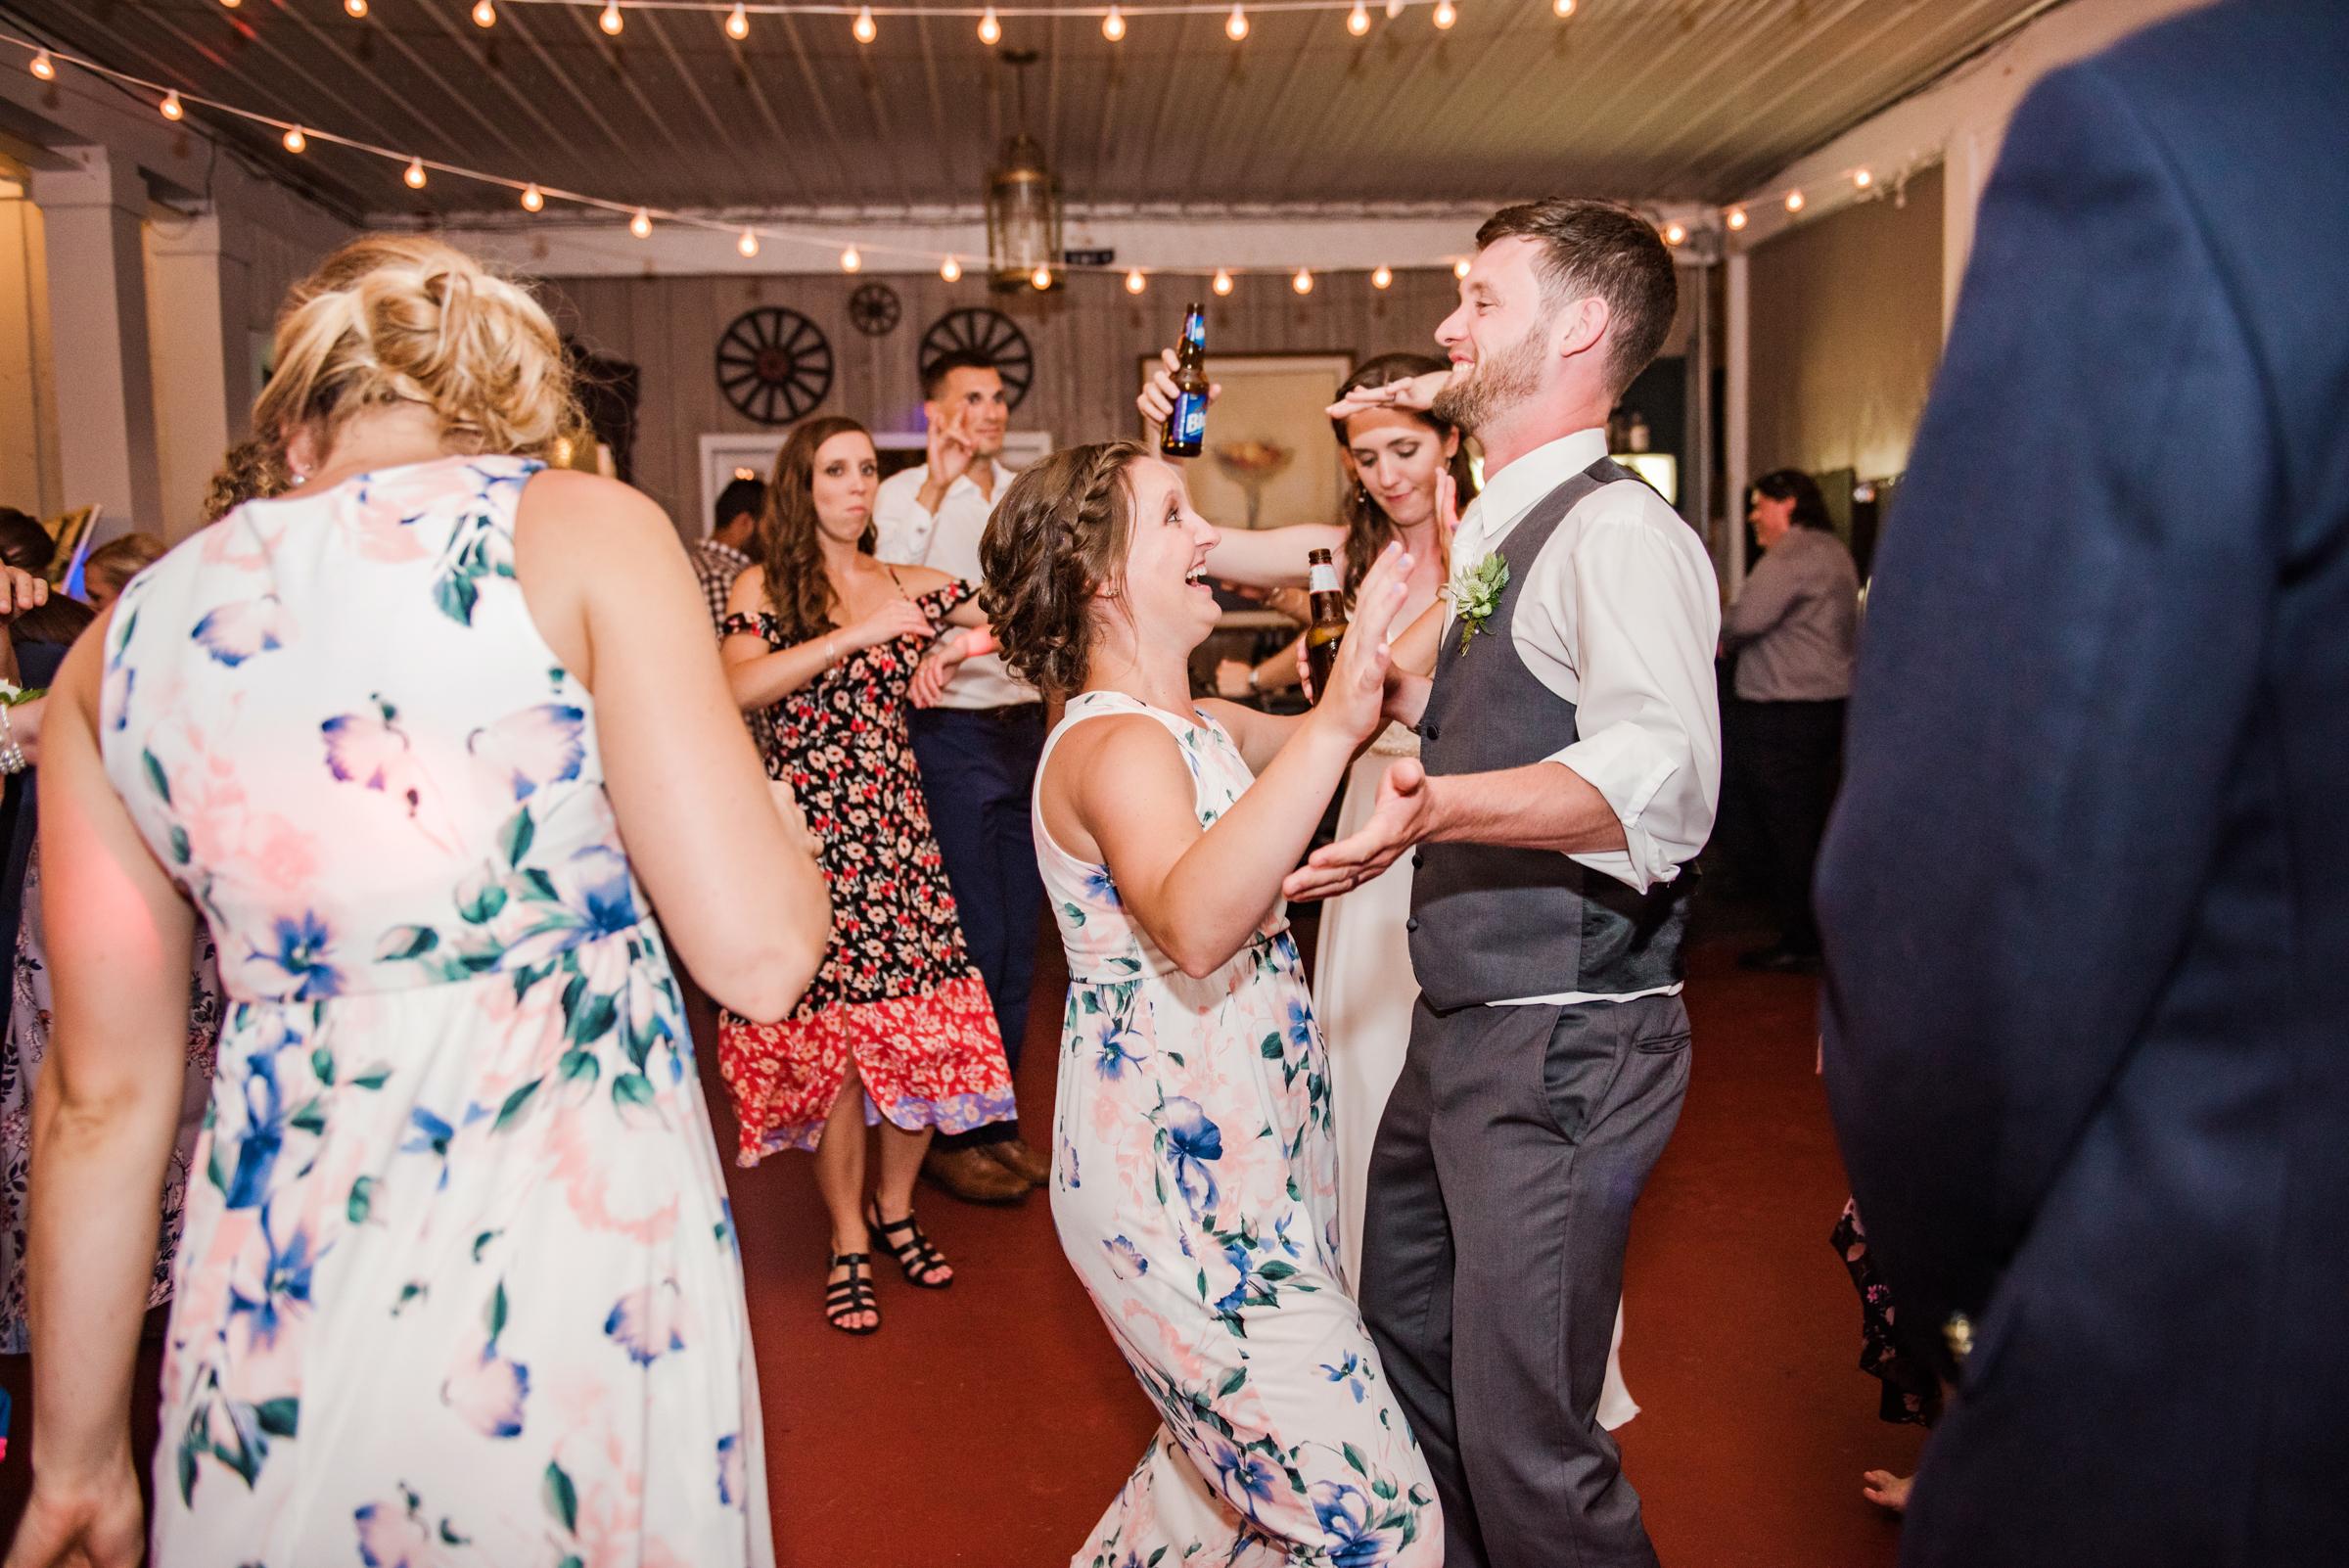 Jerris_Wadsworth_Wedding_Barn_Rochester_Wedding_JILL_STUDIO_Rochester_NY_Photographer_DSC_3202.jpg